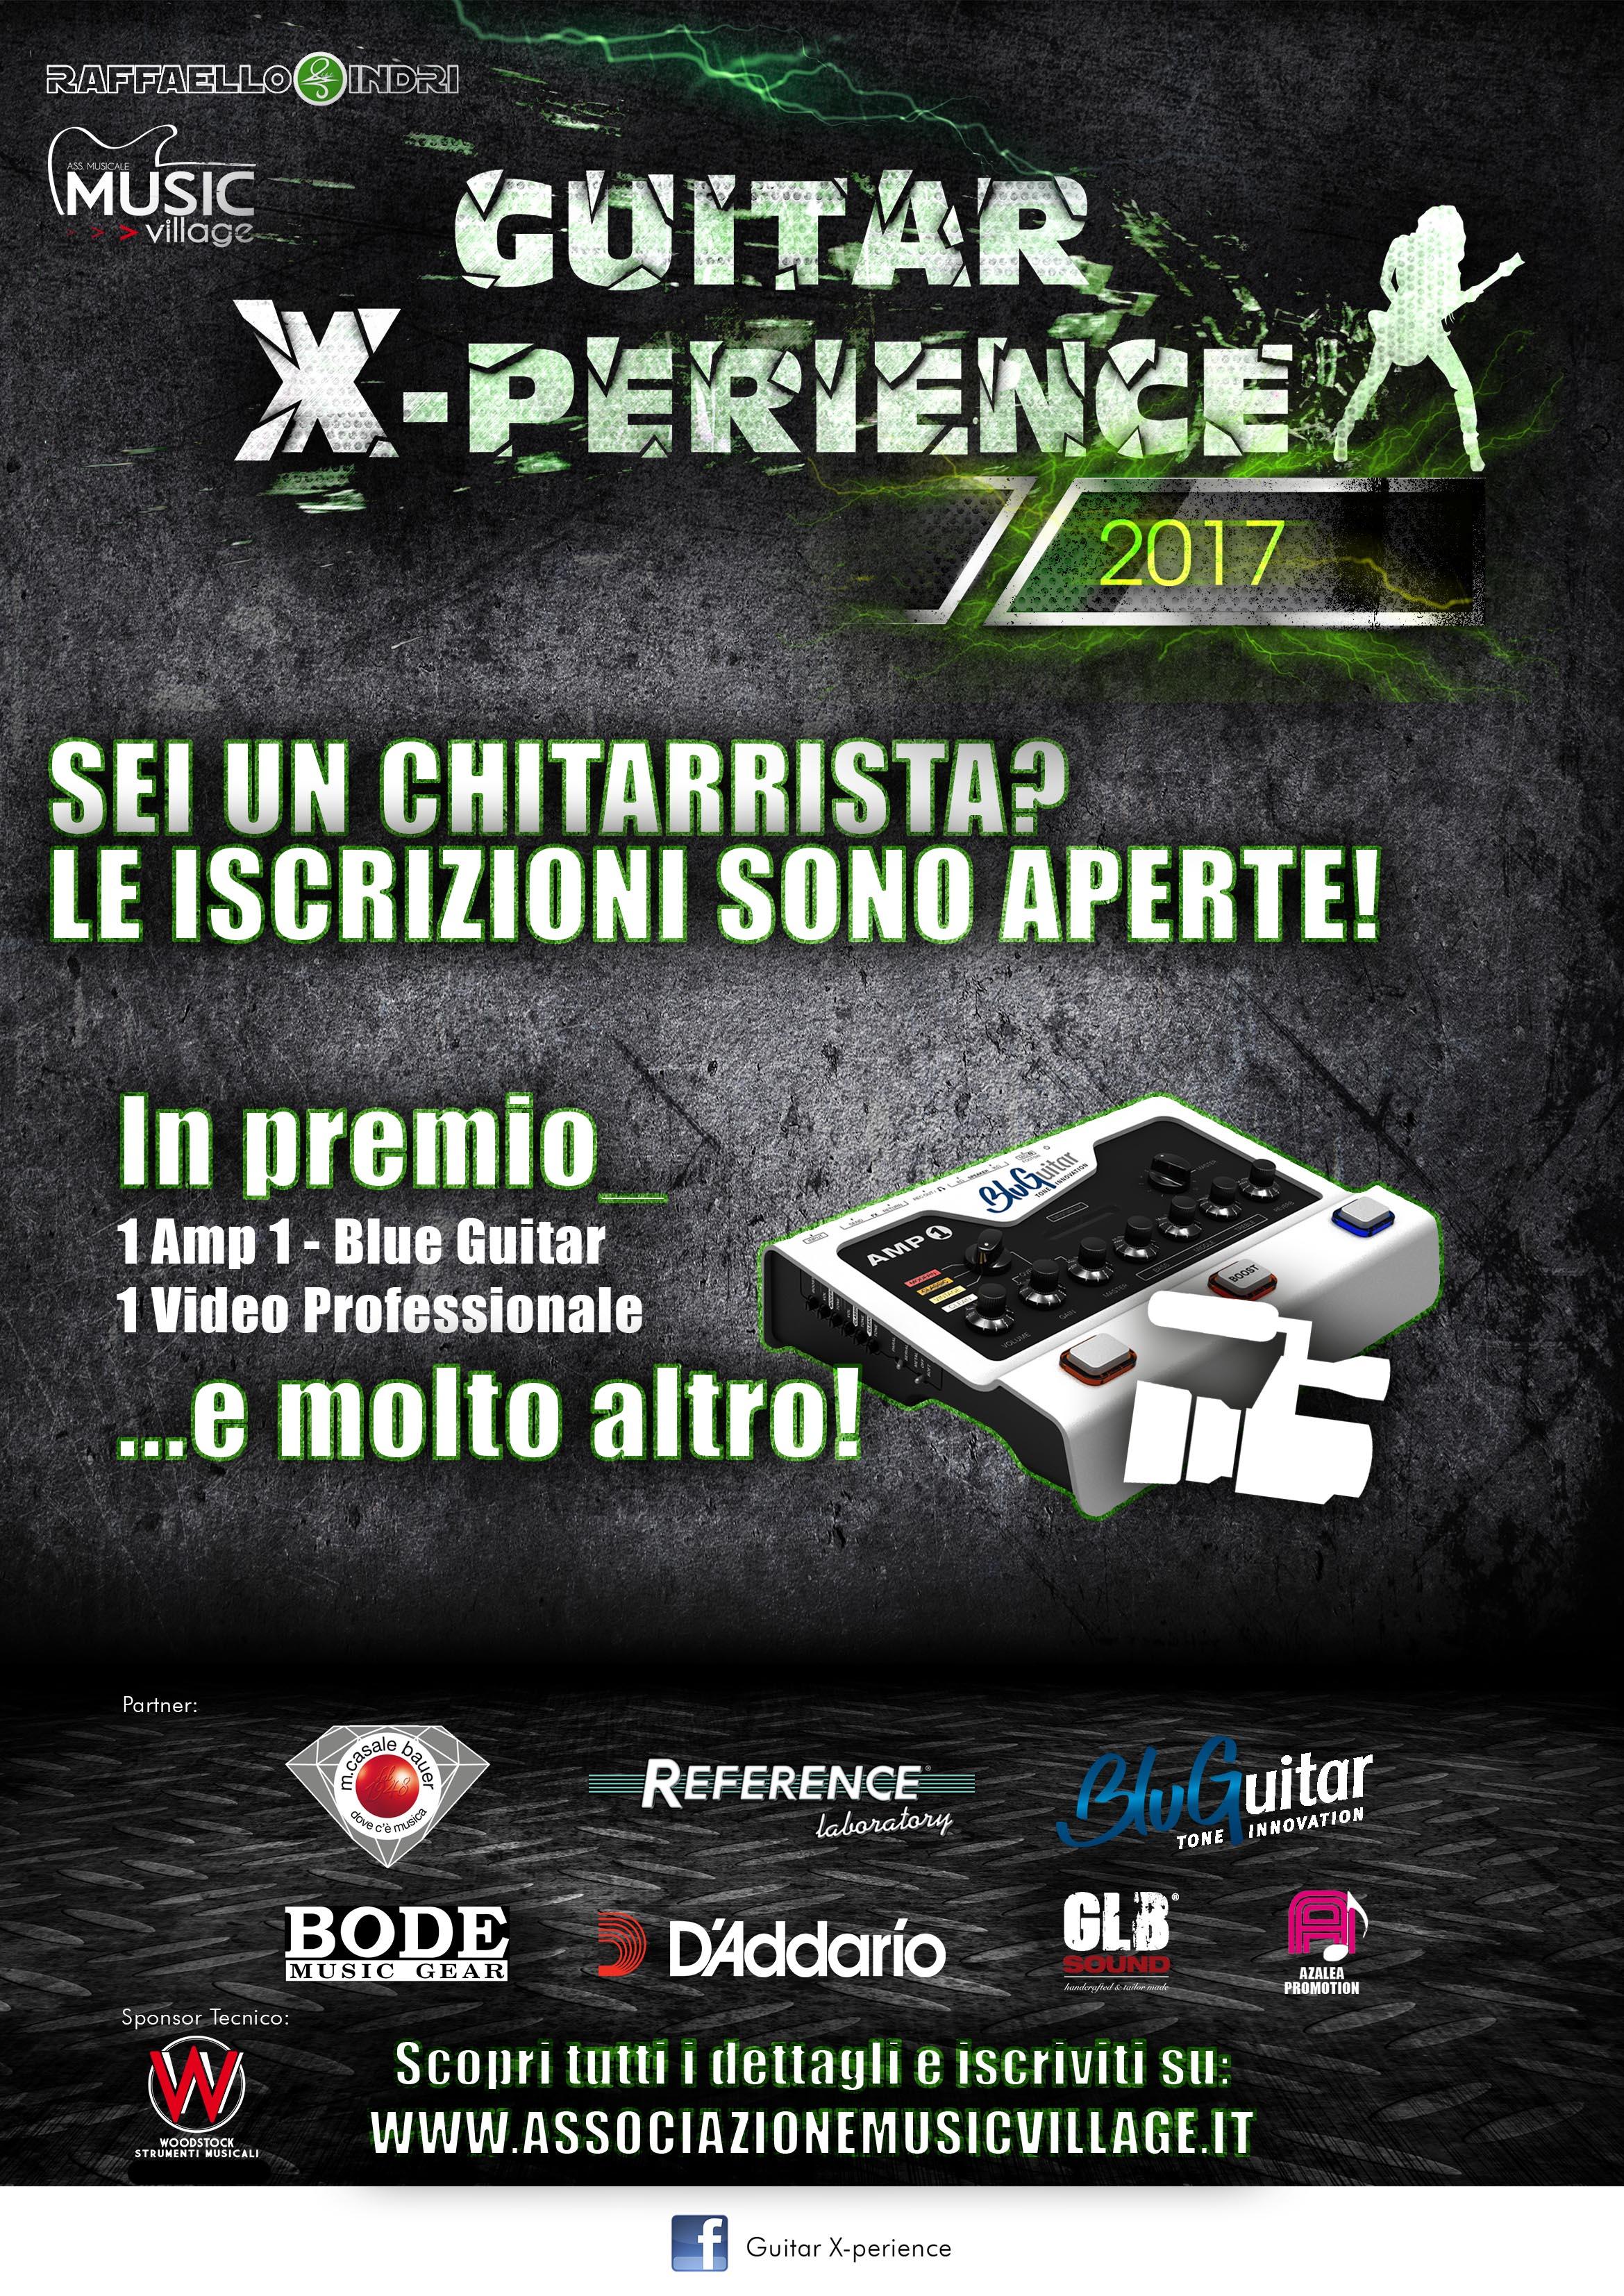 GUITAR X-PERIENCE 2017